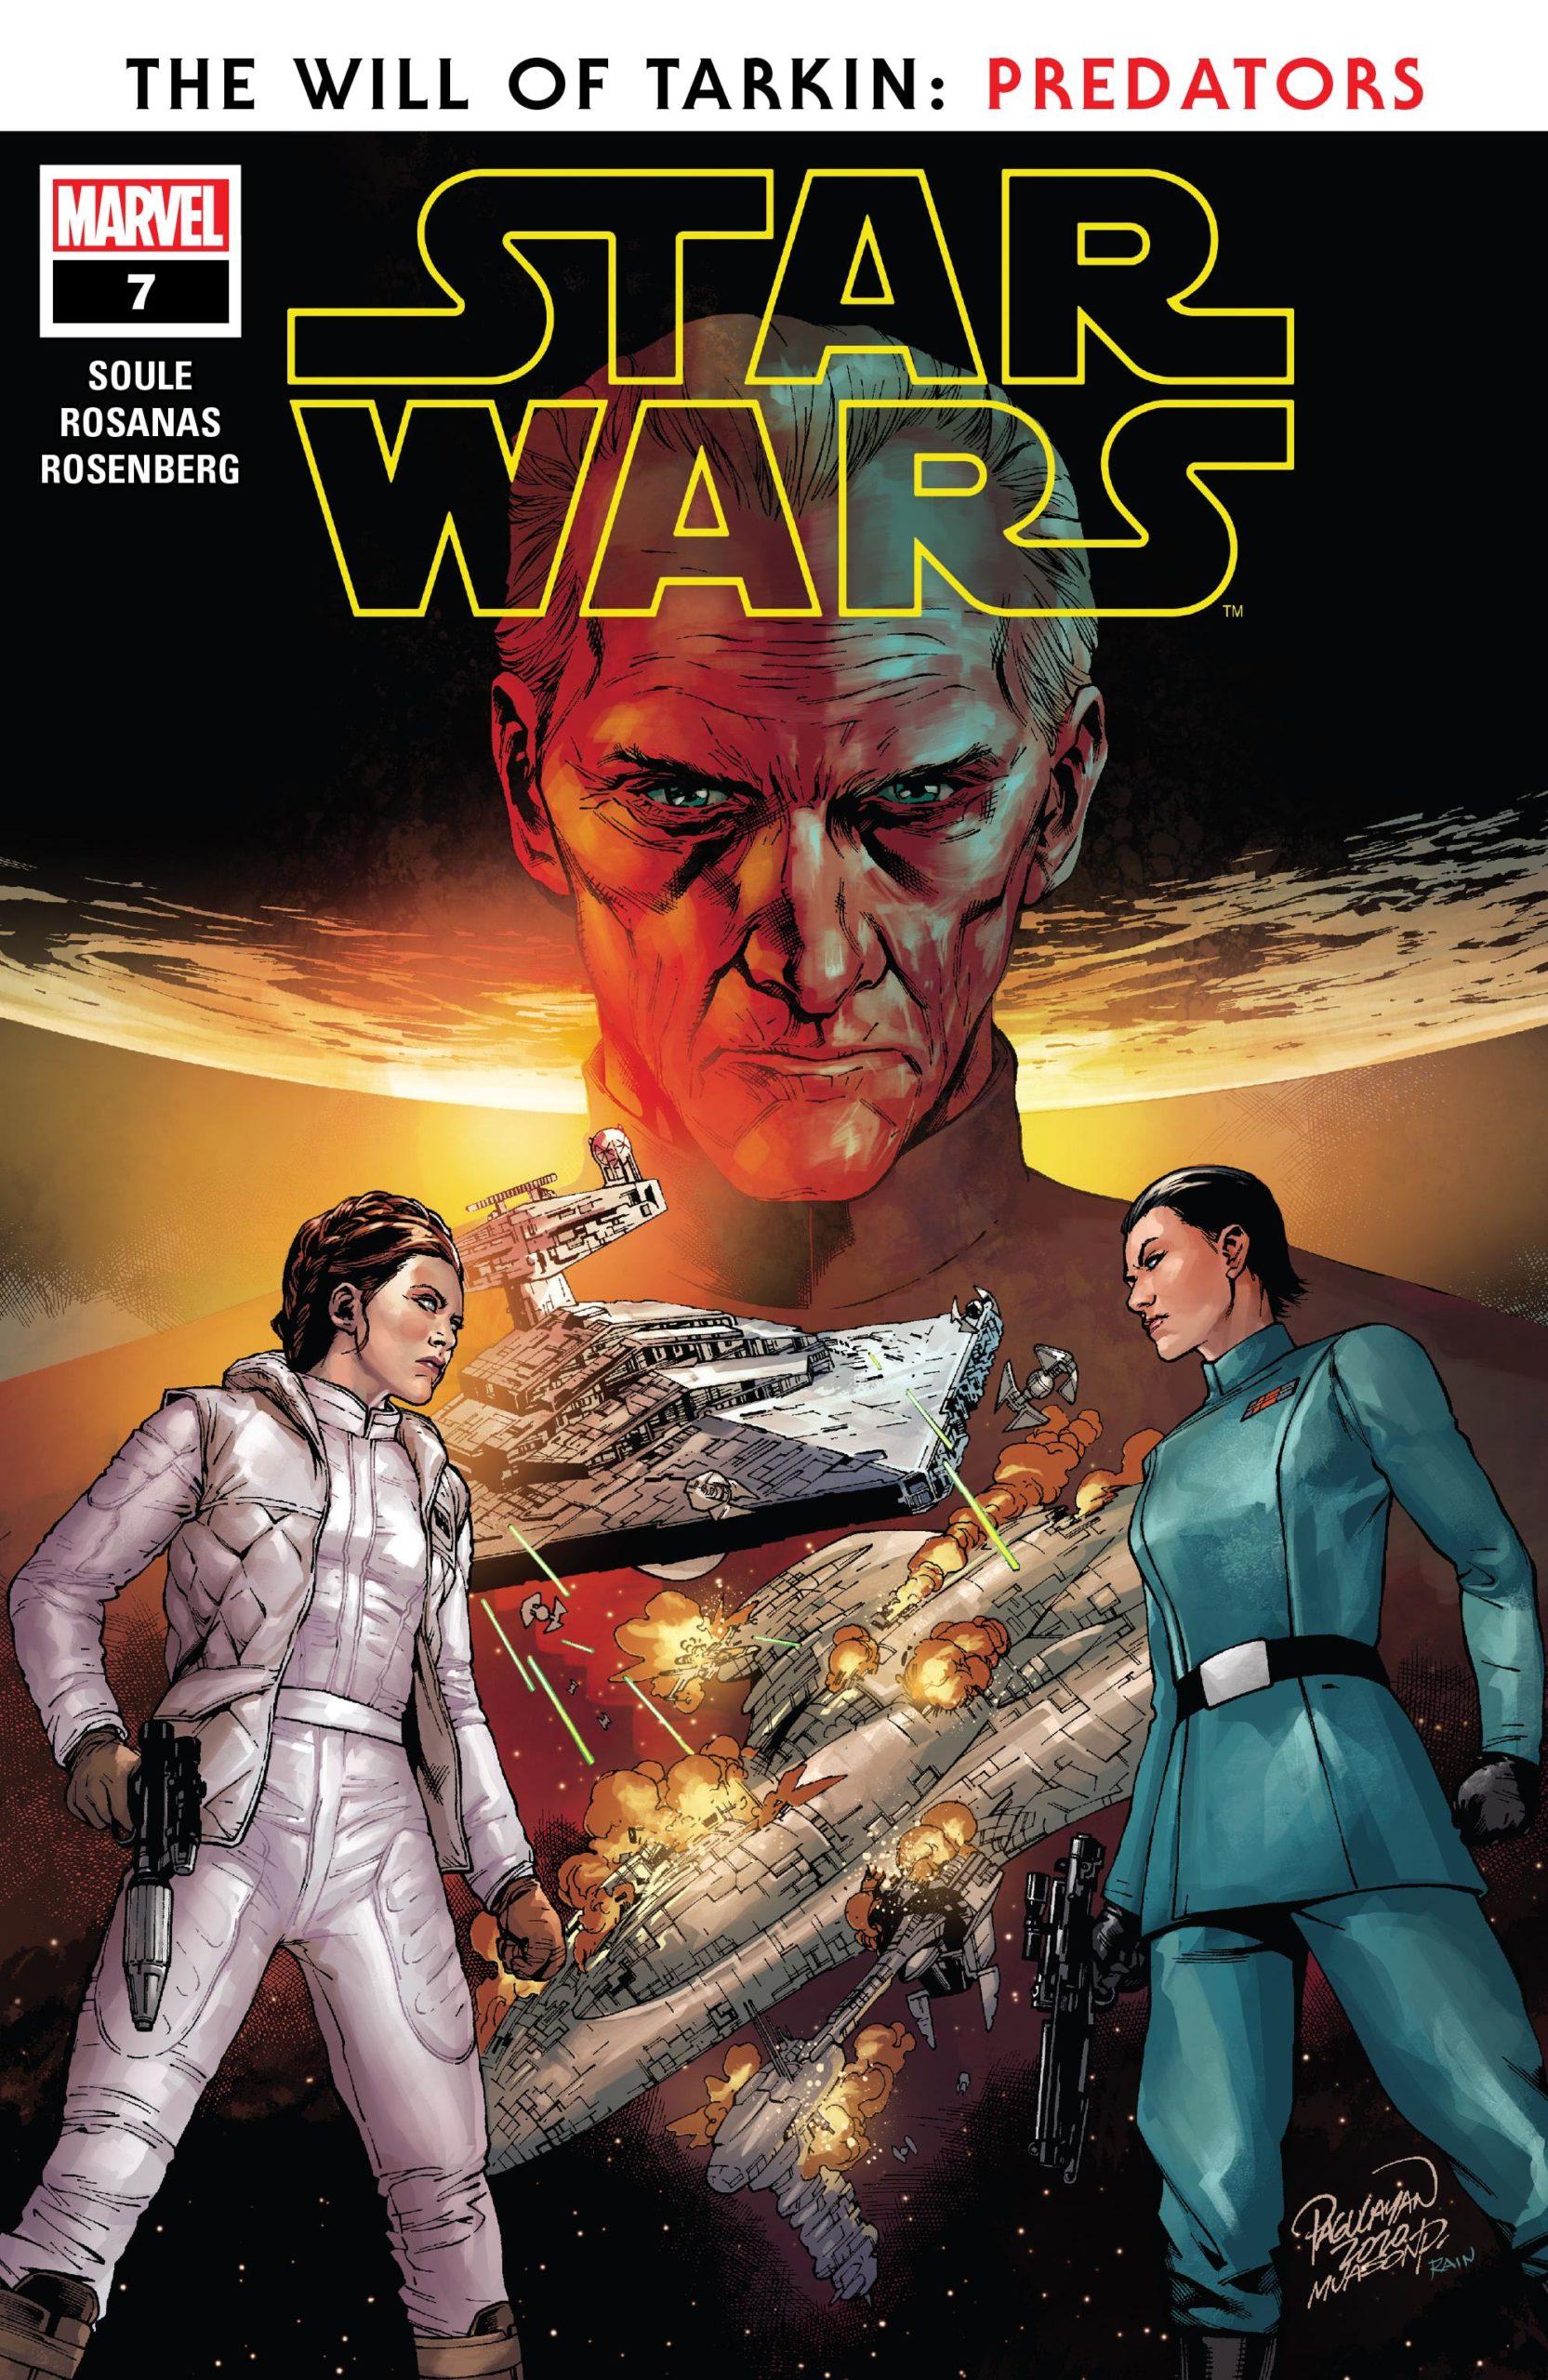 Star Wars #7 (24.06.2020)